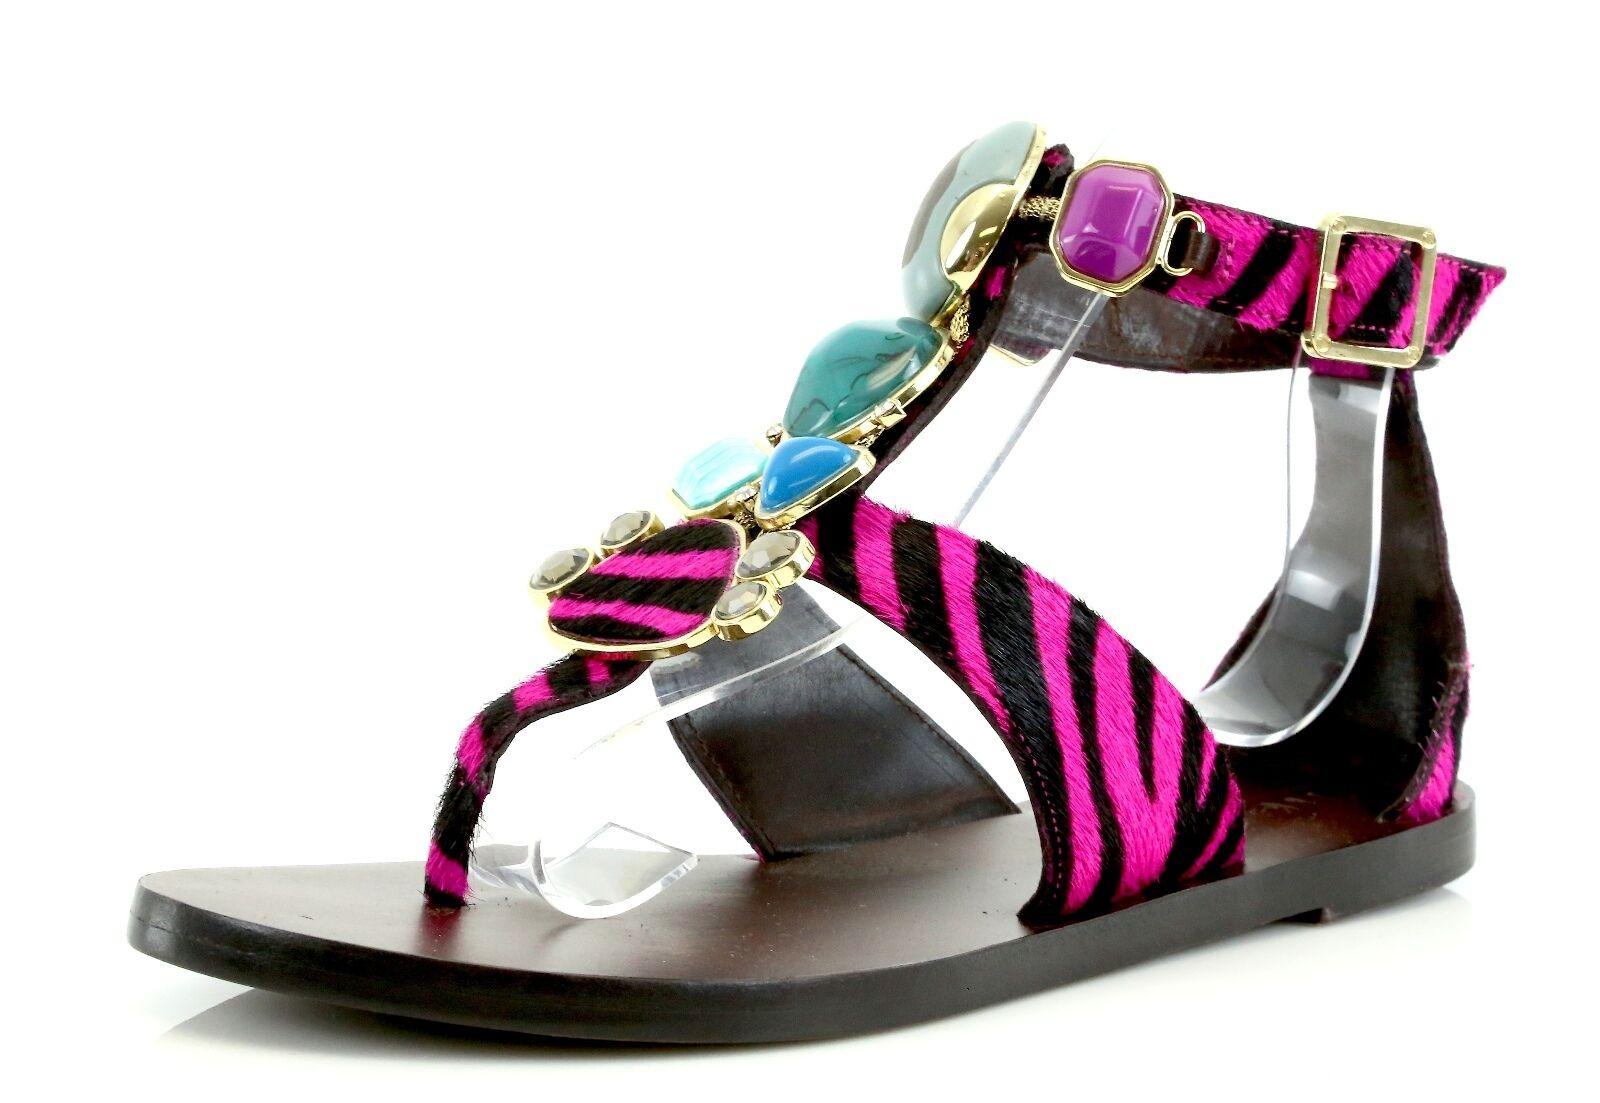 Miss.Trish STONED Pink Zebra Print Ankle Strap Sandals 7070 Size 8 M NEW